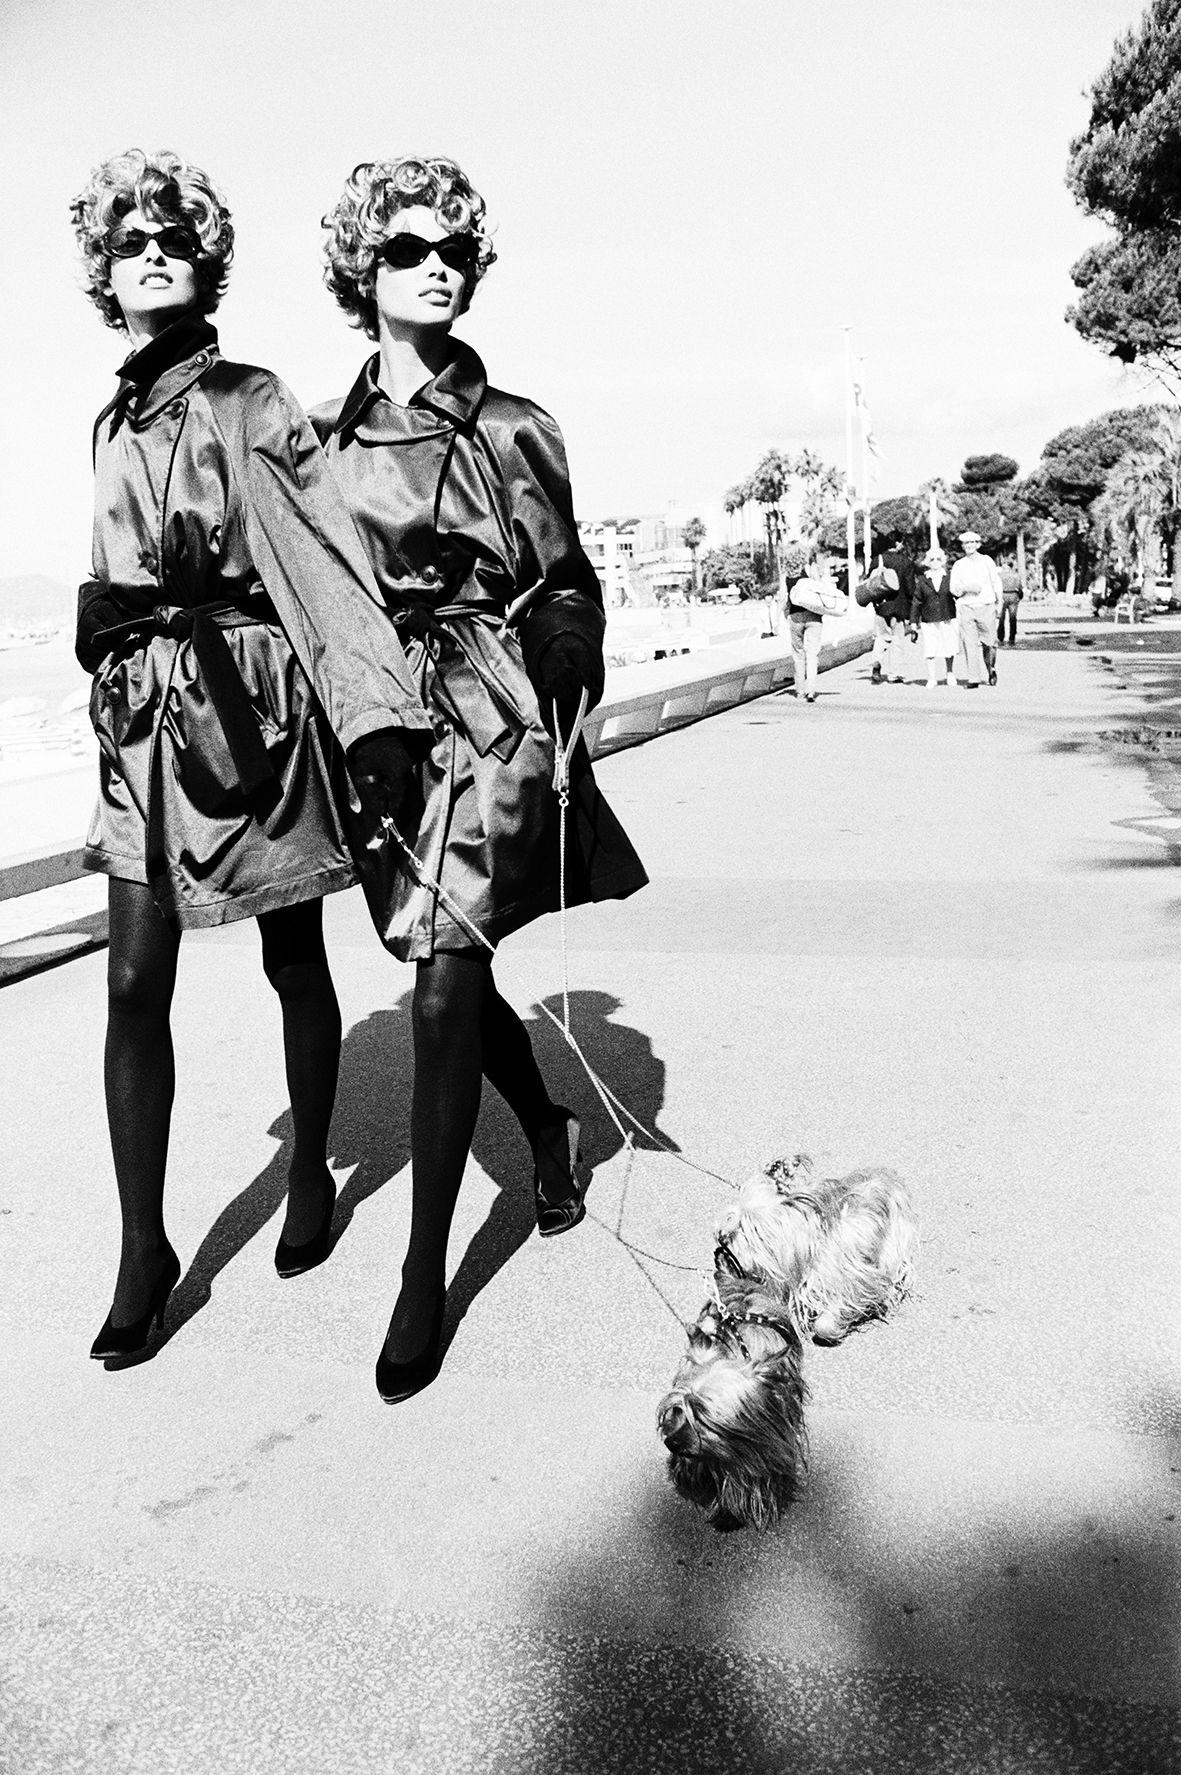 Dog Walkers, 1990, Silver Gelatin Photograph